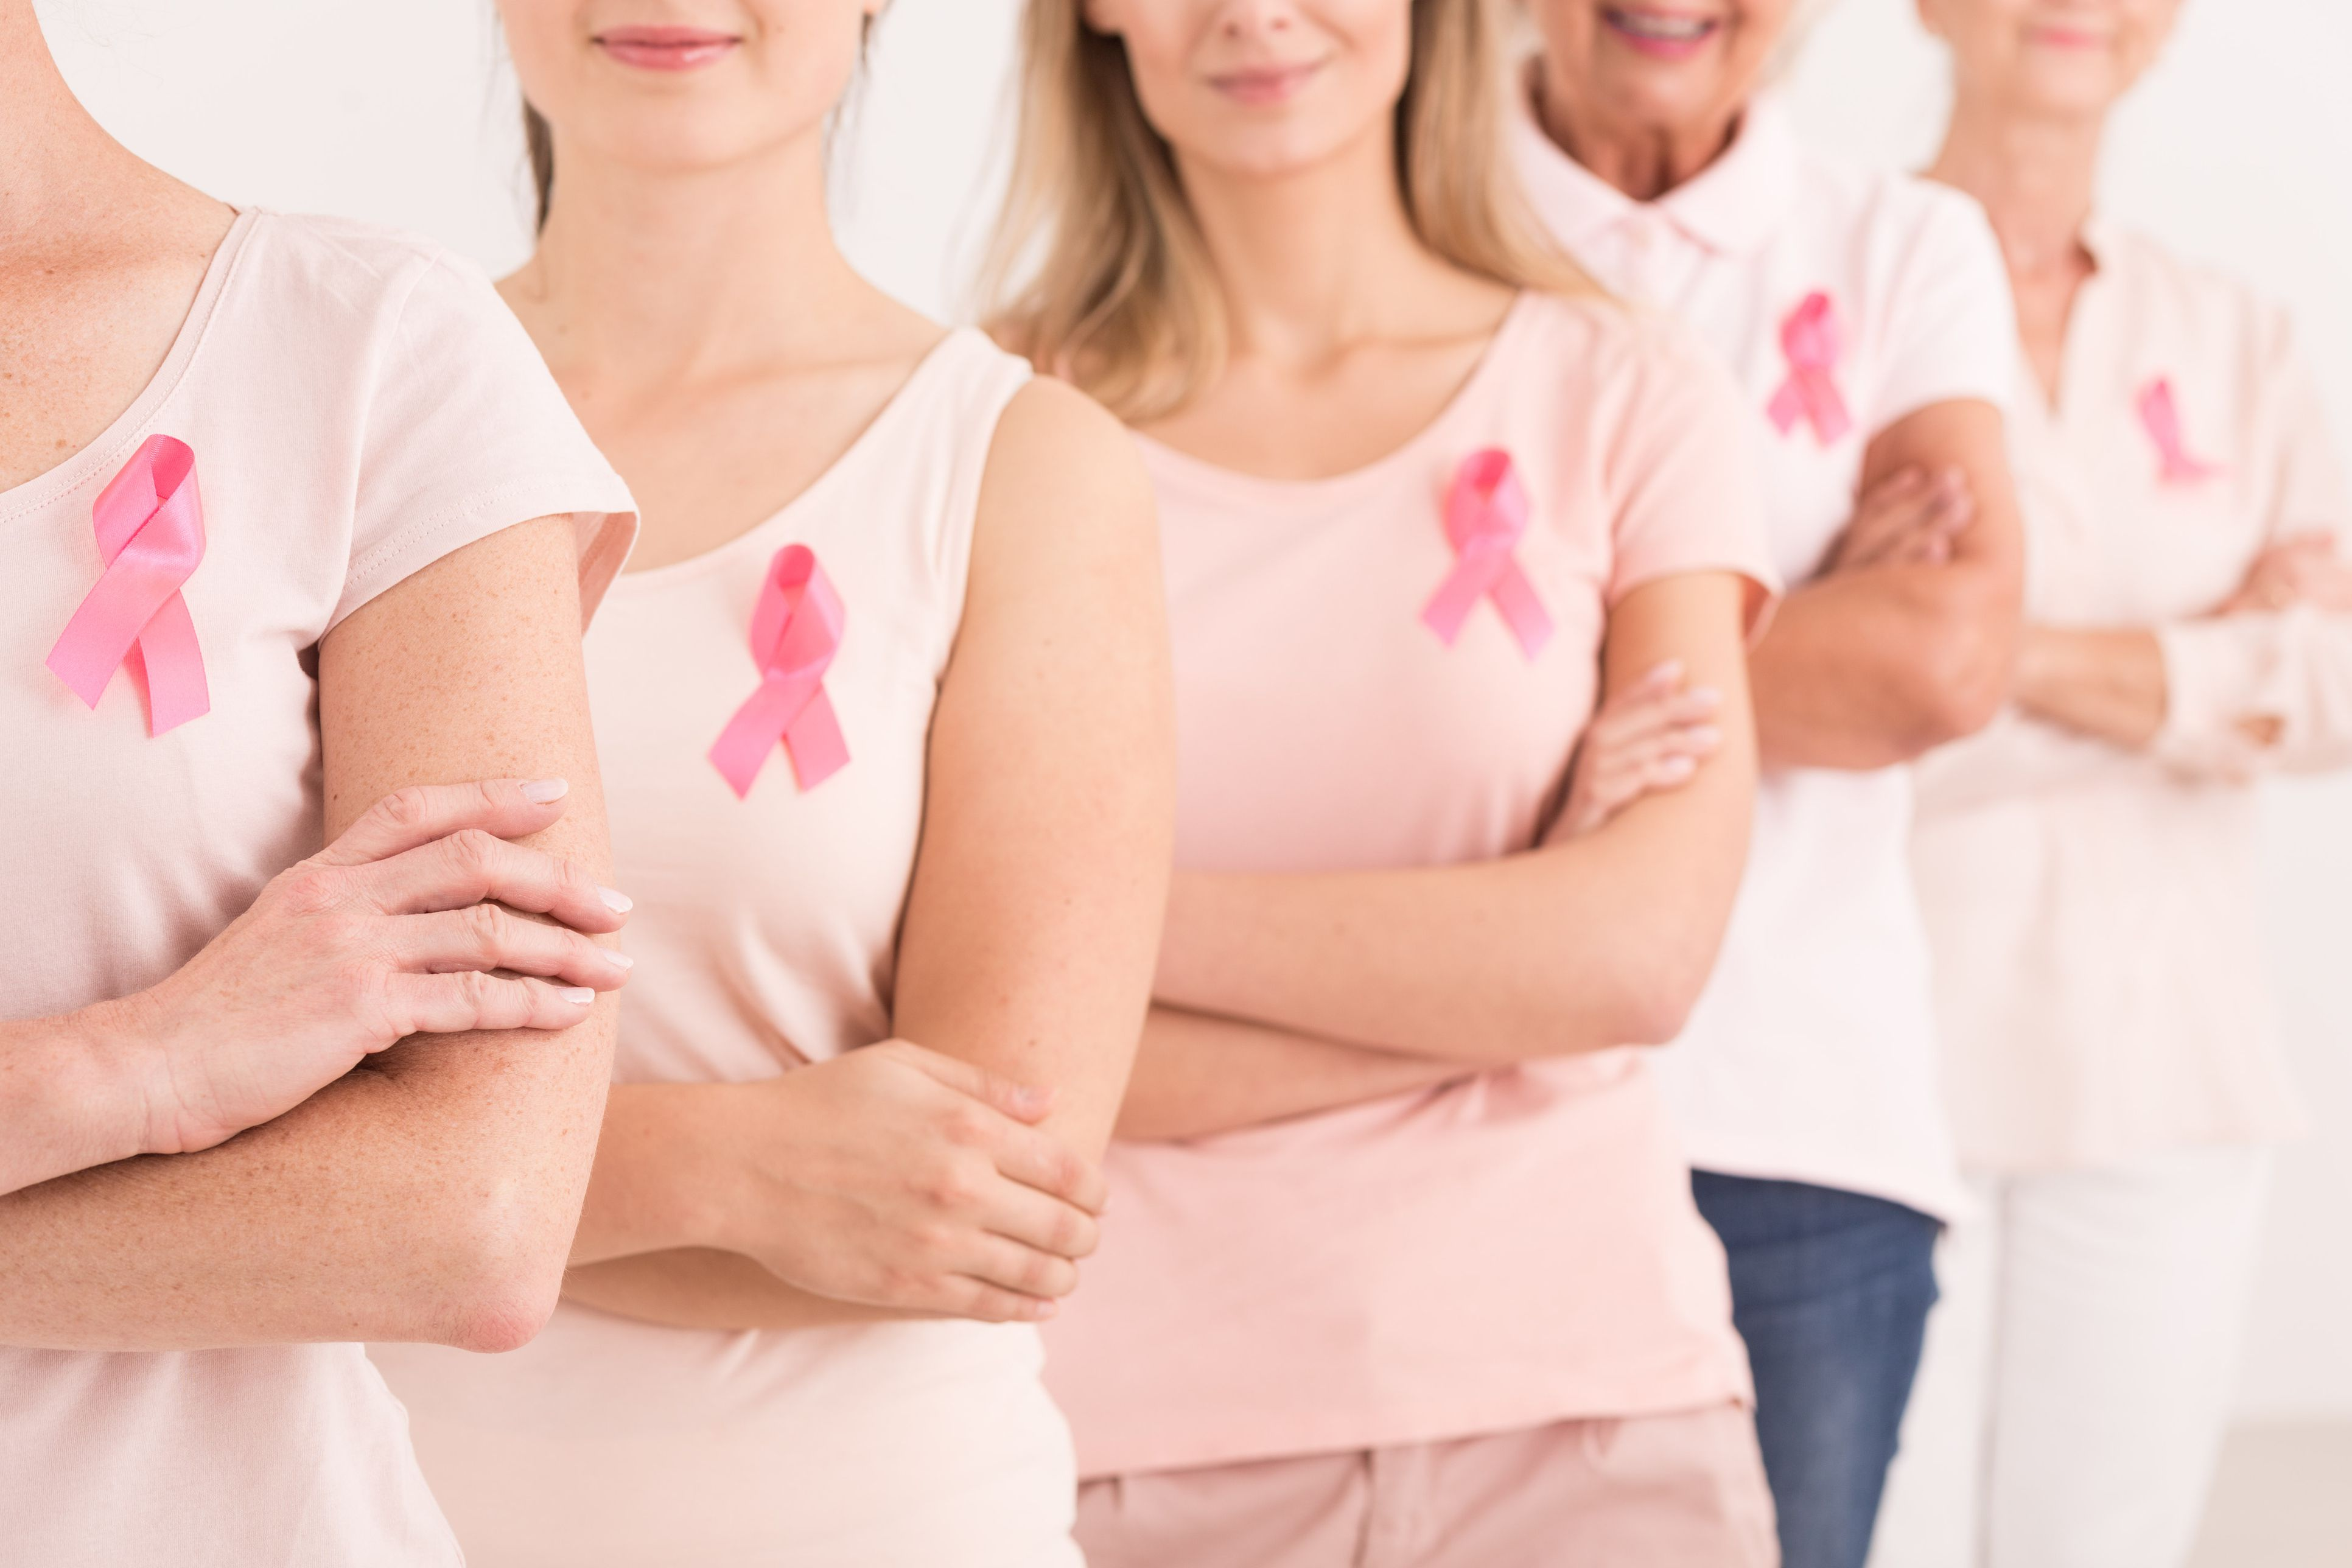 Choosing Between Single vs. Double Mastectomy